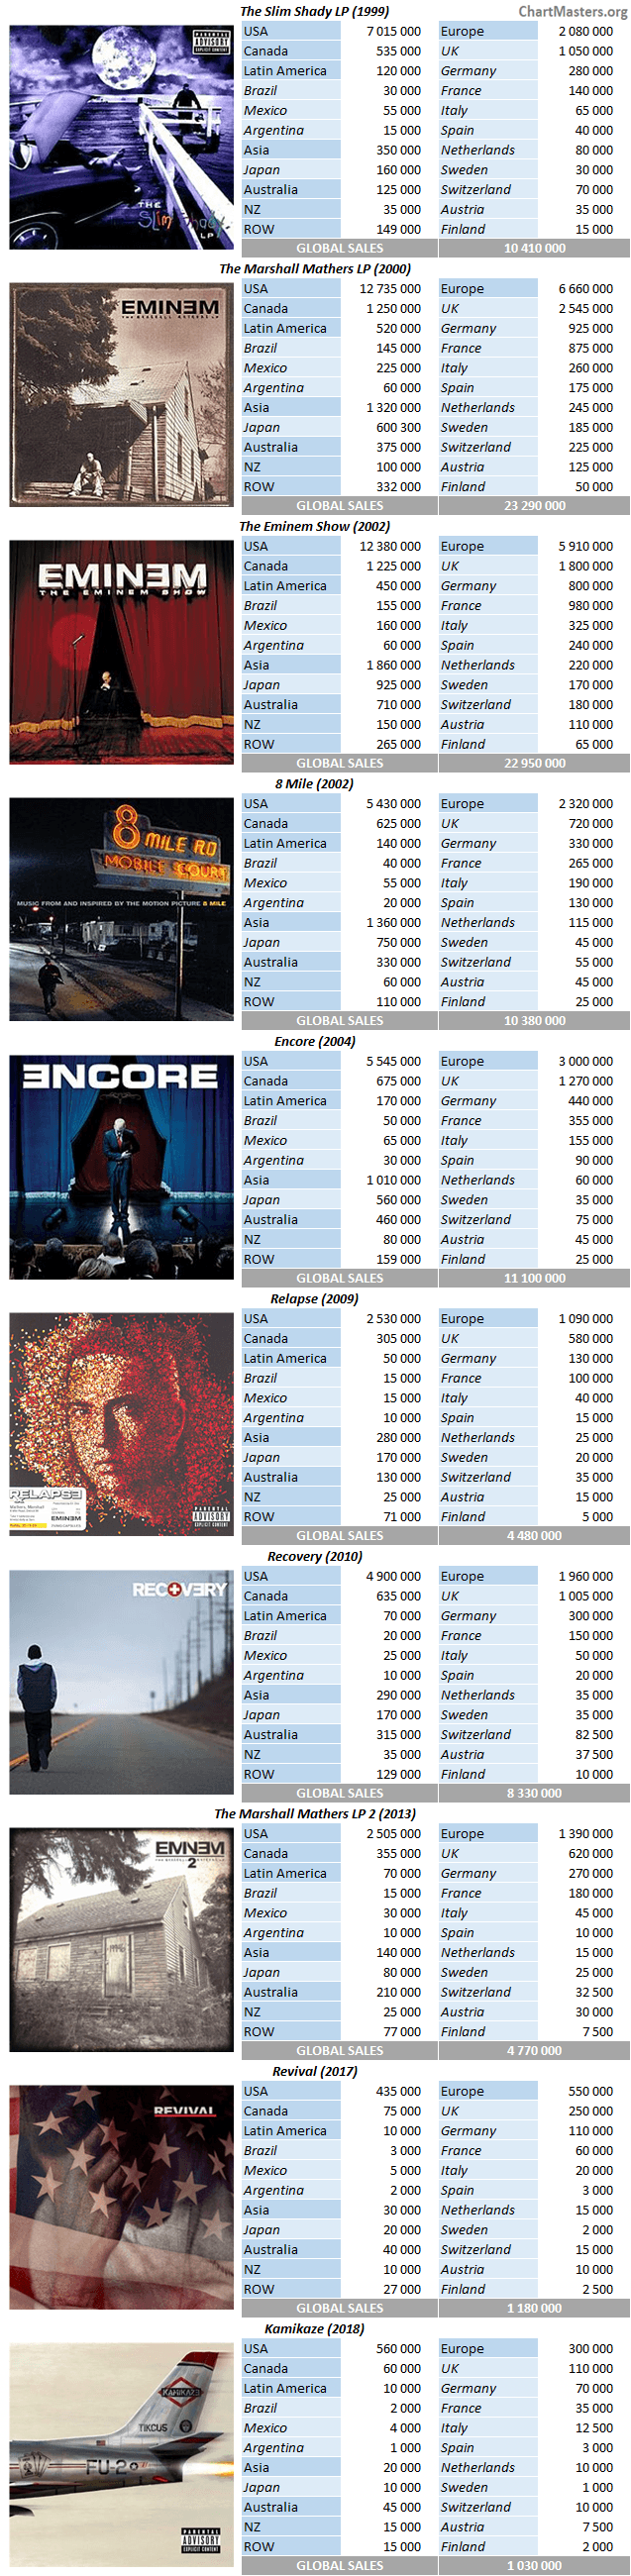 Eminem Album Sales : eminem, album, sales, 938FF66E-EB89-4EBB-8168-A48BF03378A5, Eminem.Pro, Biggest, Trusted, Source, Eminem